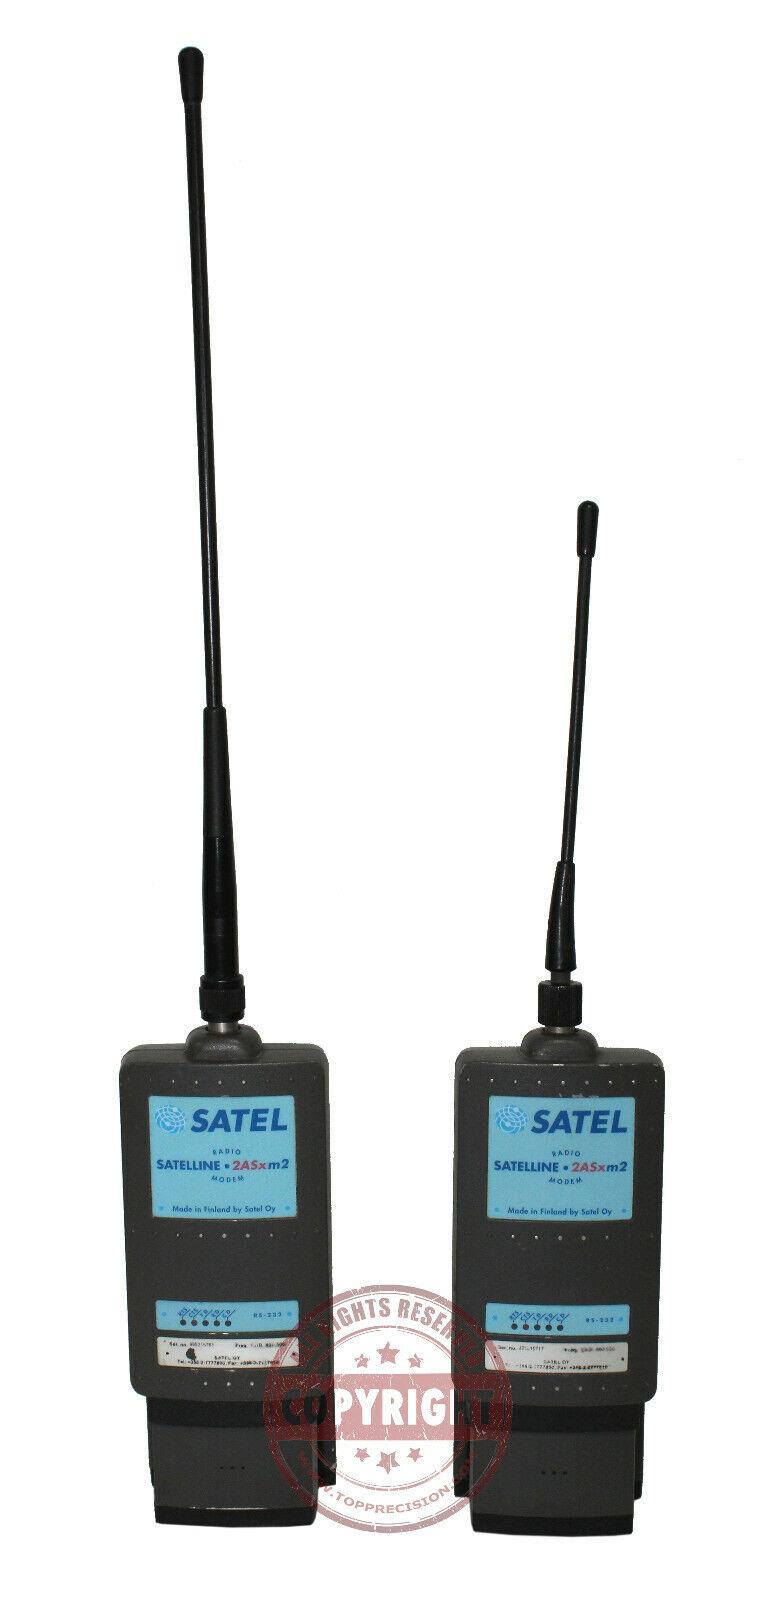 SATEL SATELLINE-2ASxm2 ROBOTIC MODEM RADIO,TOPCON GTS, GPT TOTAL STATION